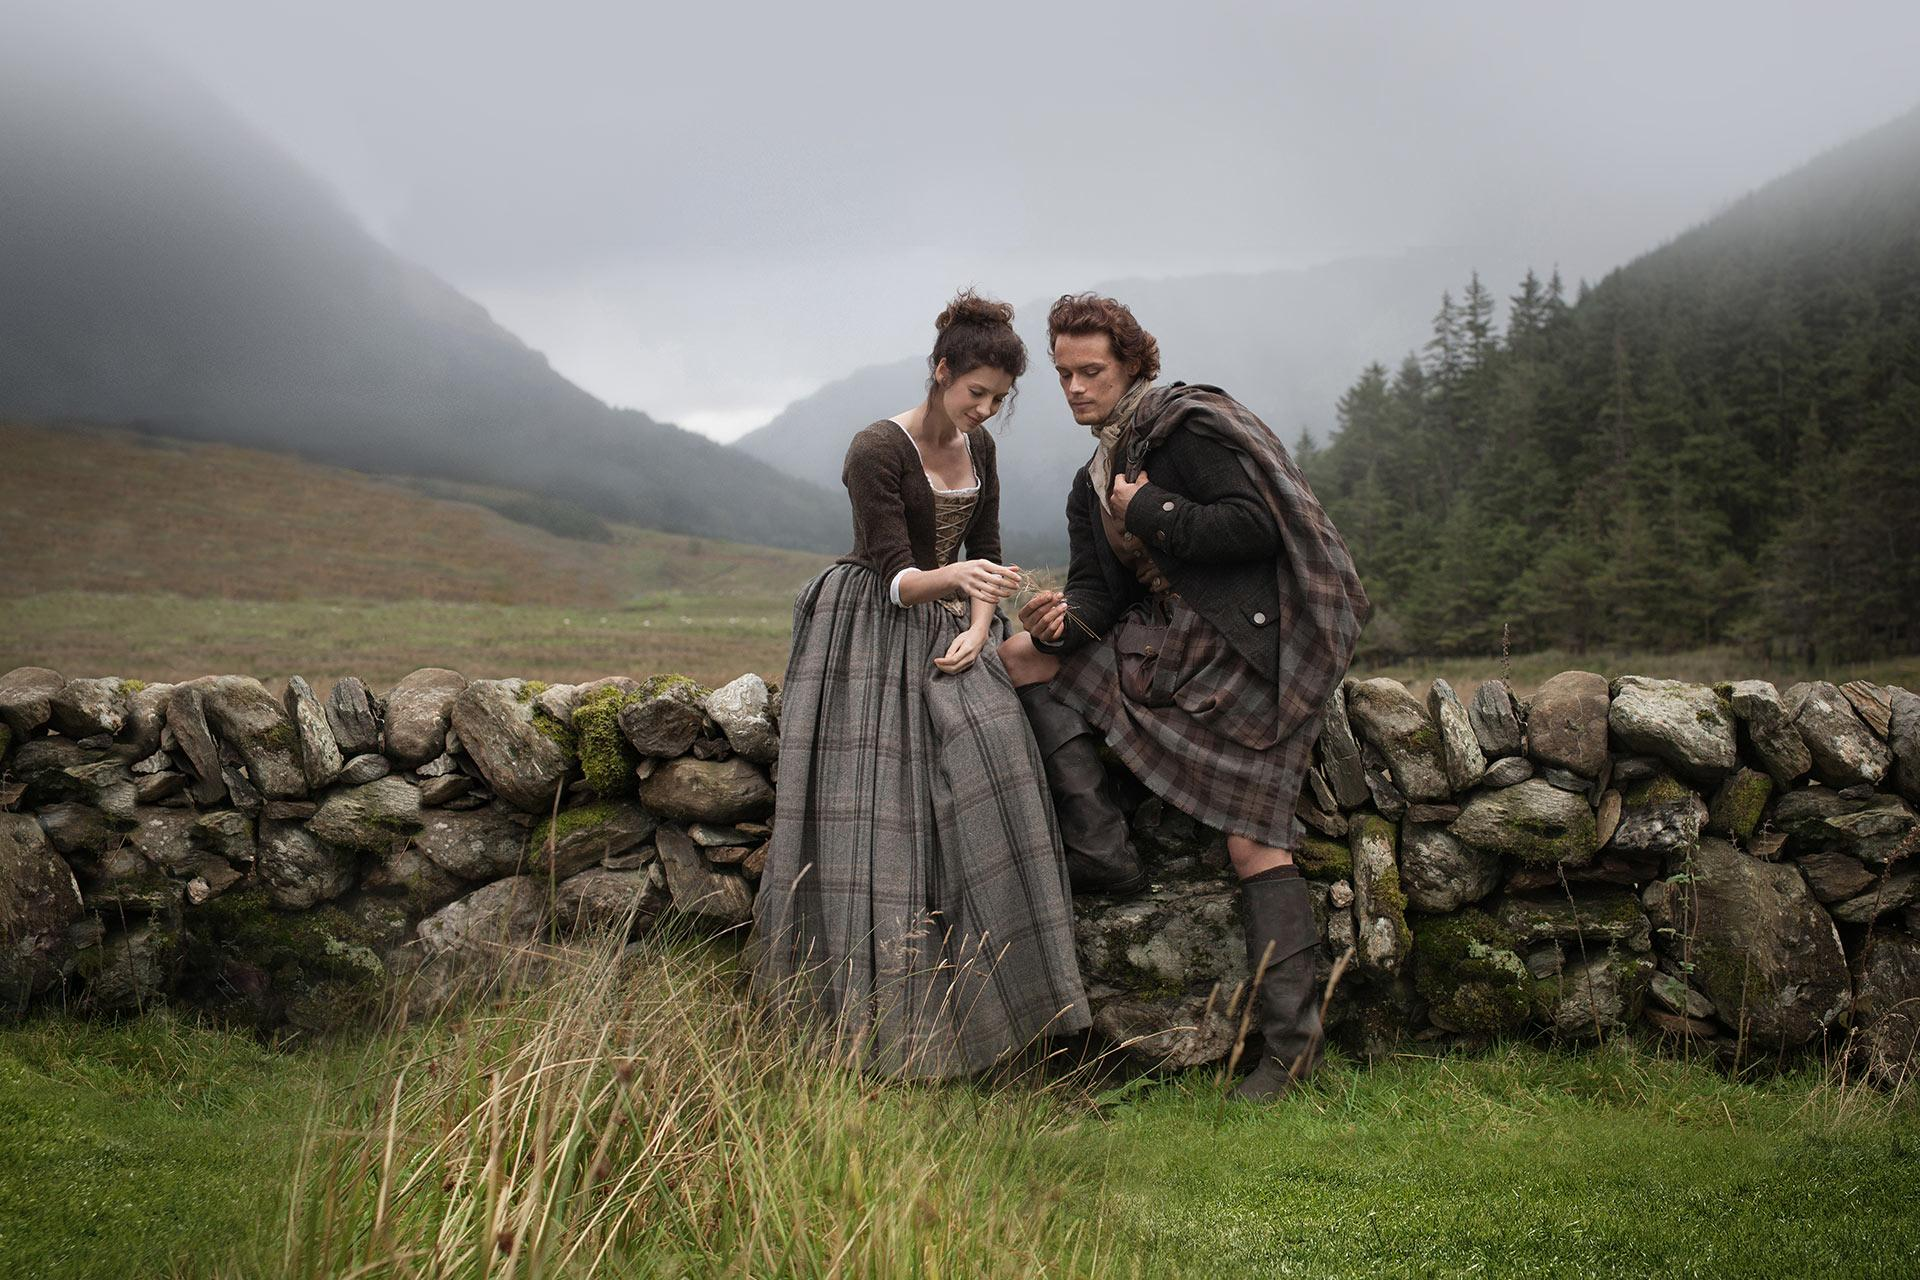 Itinerario De Outlander De 12 D As Ruta Por Escocia En Coche  # Barre Duque Muebles